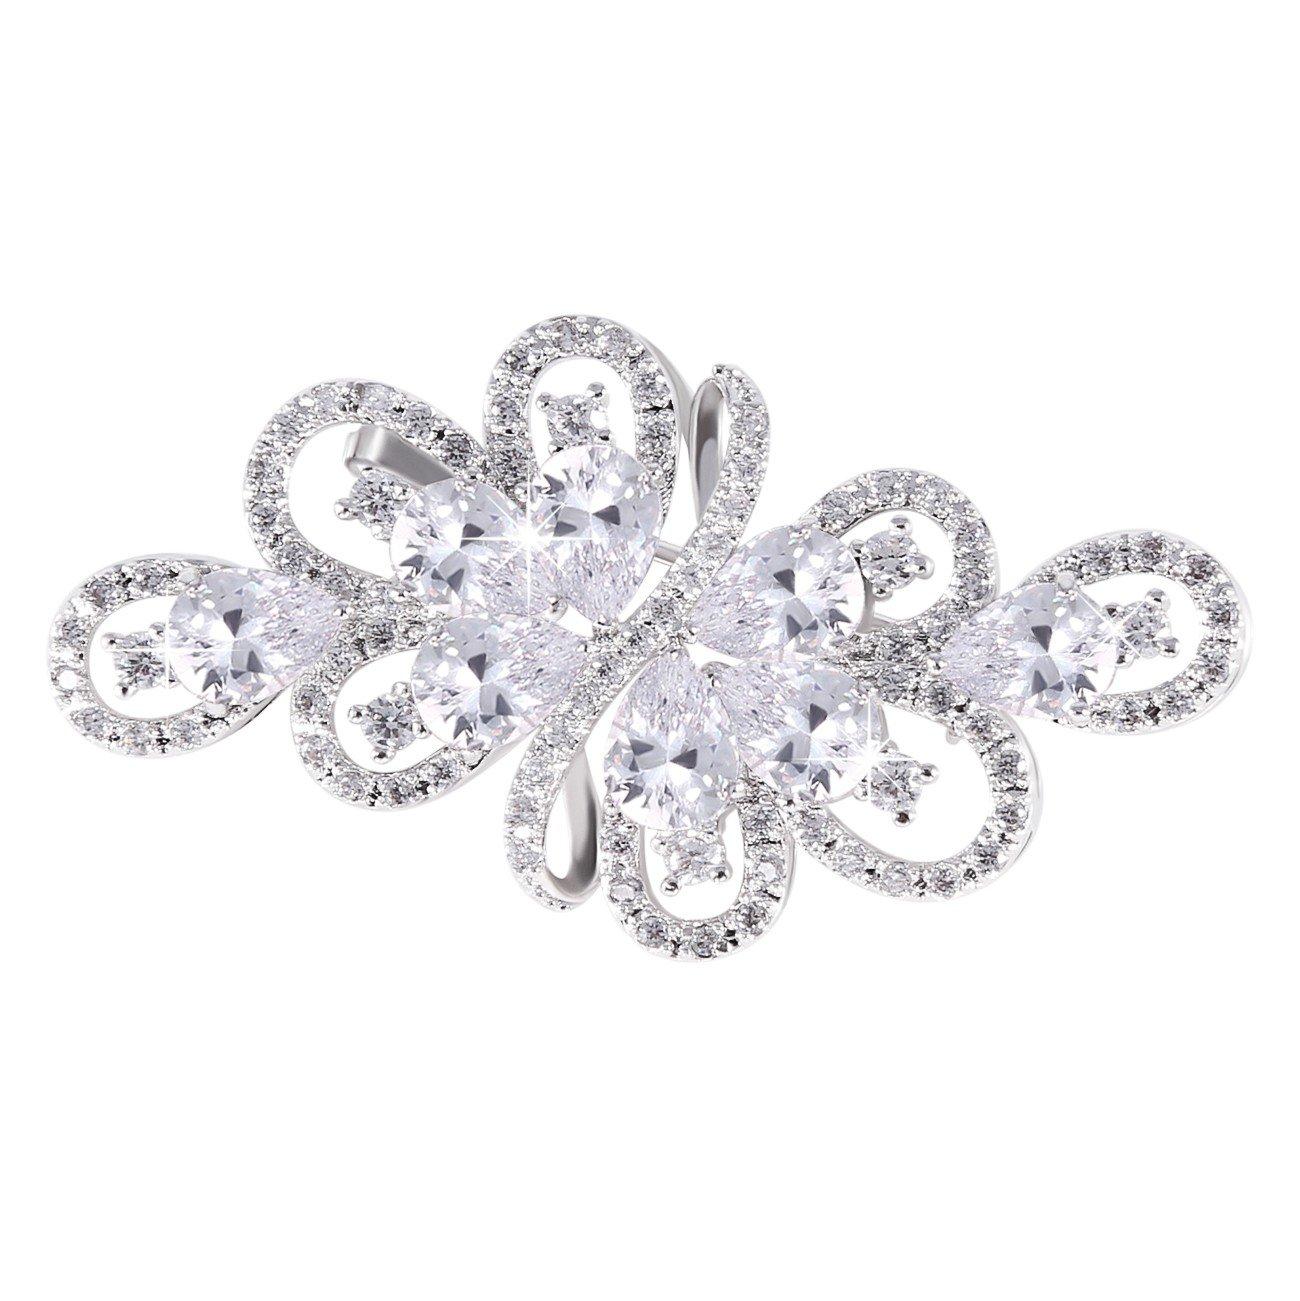 GULICX Bridal Clear Ribbon Bouquet Brooch Silver Tone Zircon Wedding Women Jewelry